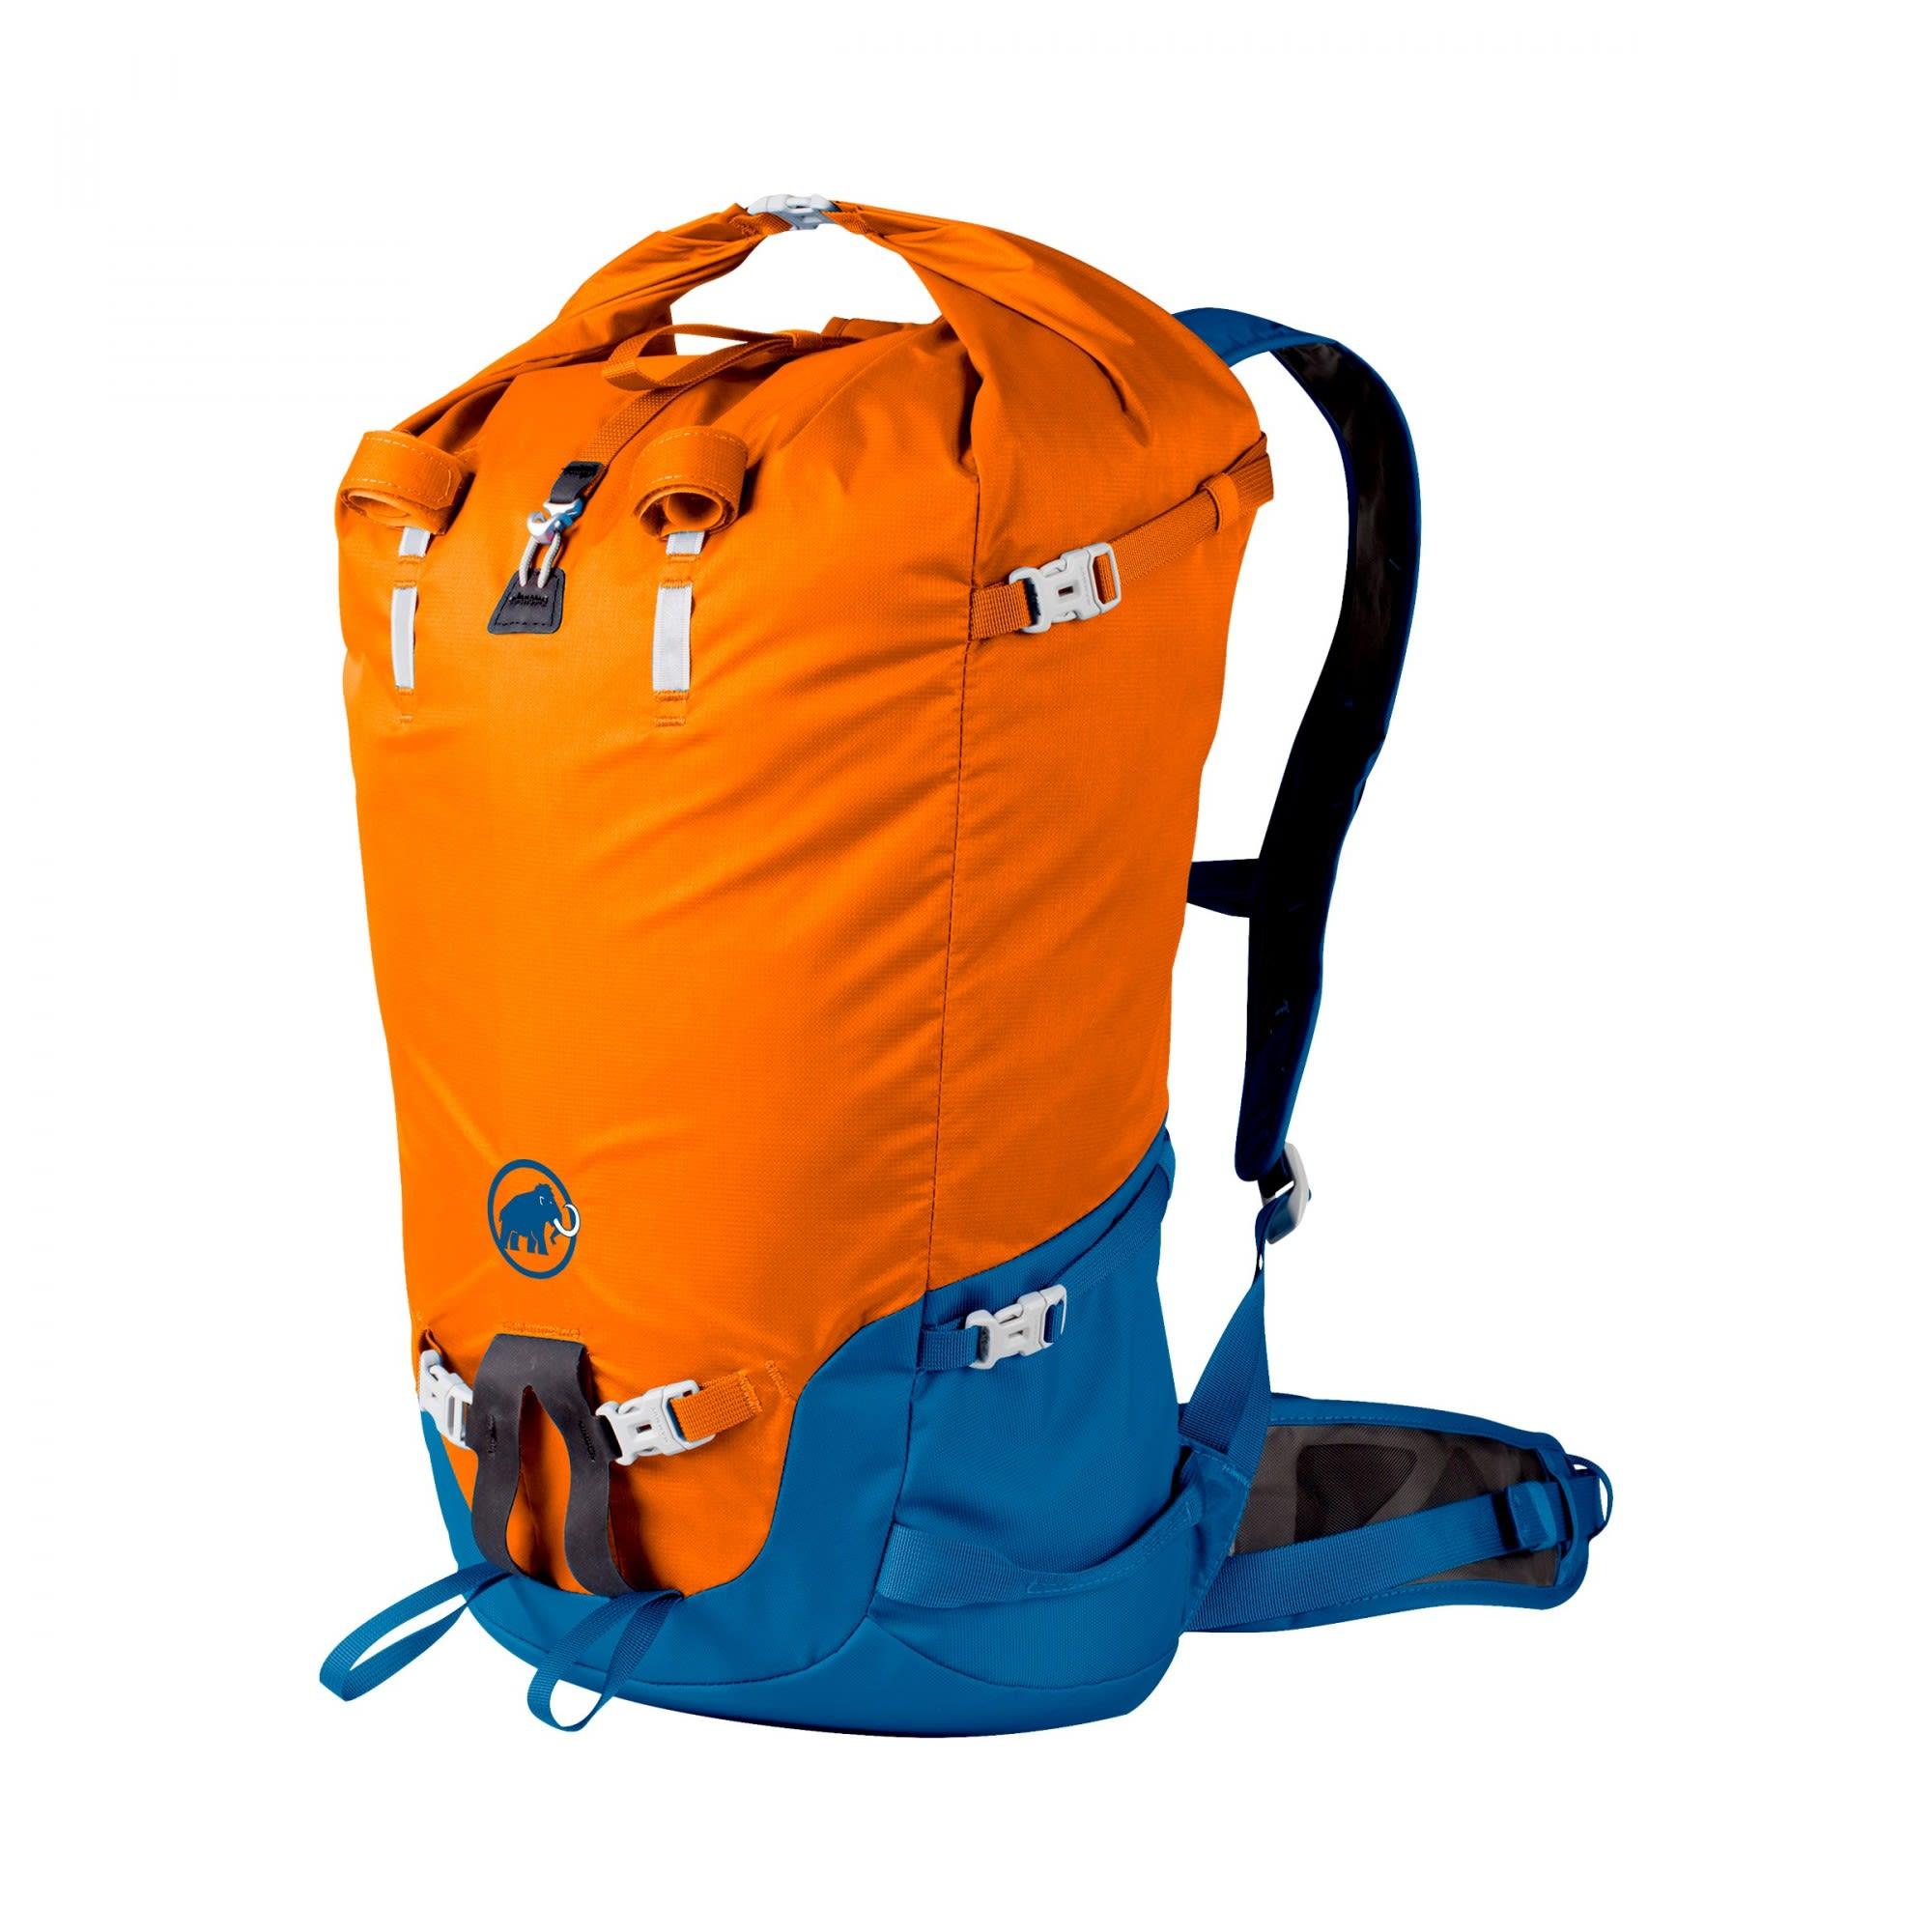 Mammut Trion Light 28 Orange, Alpin-& Trekkingrucksack, 28l